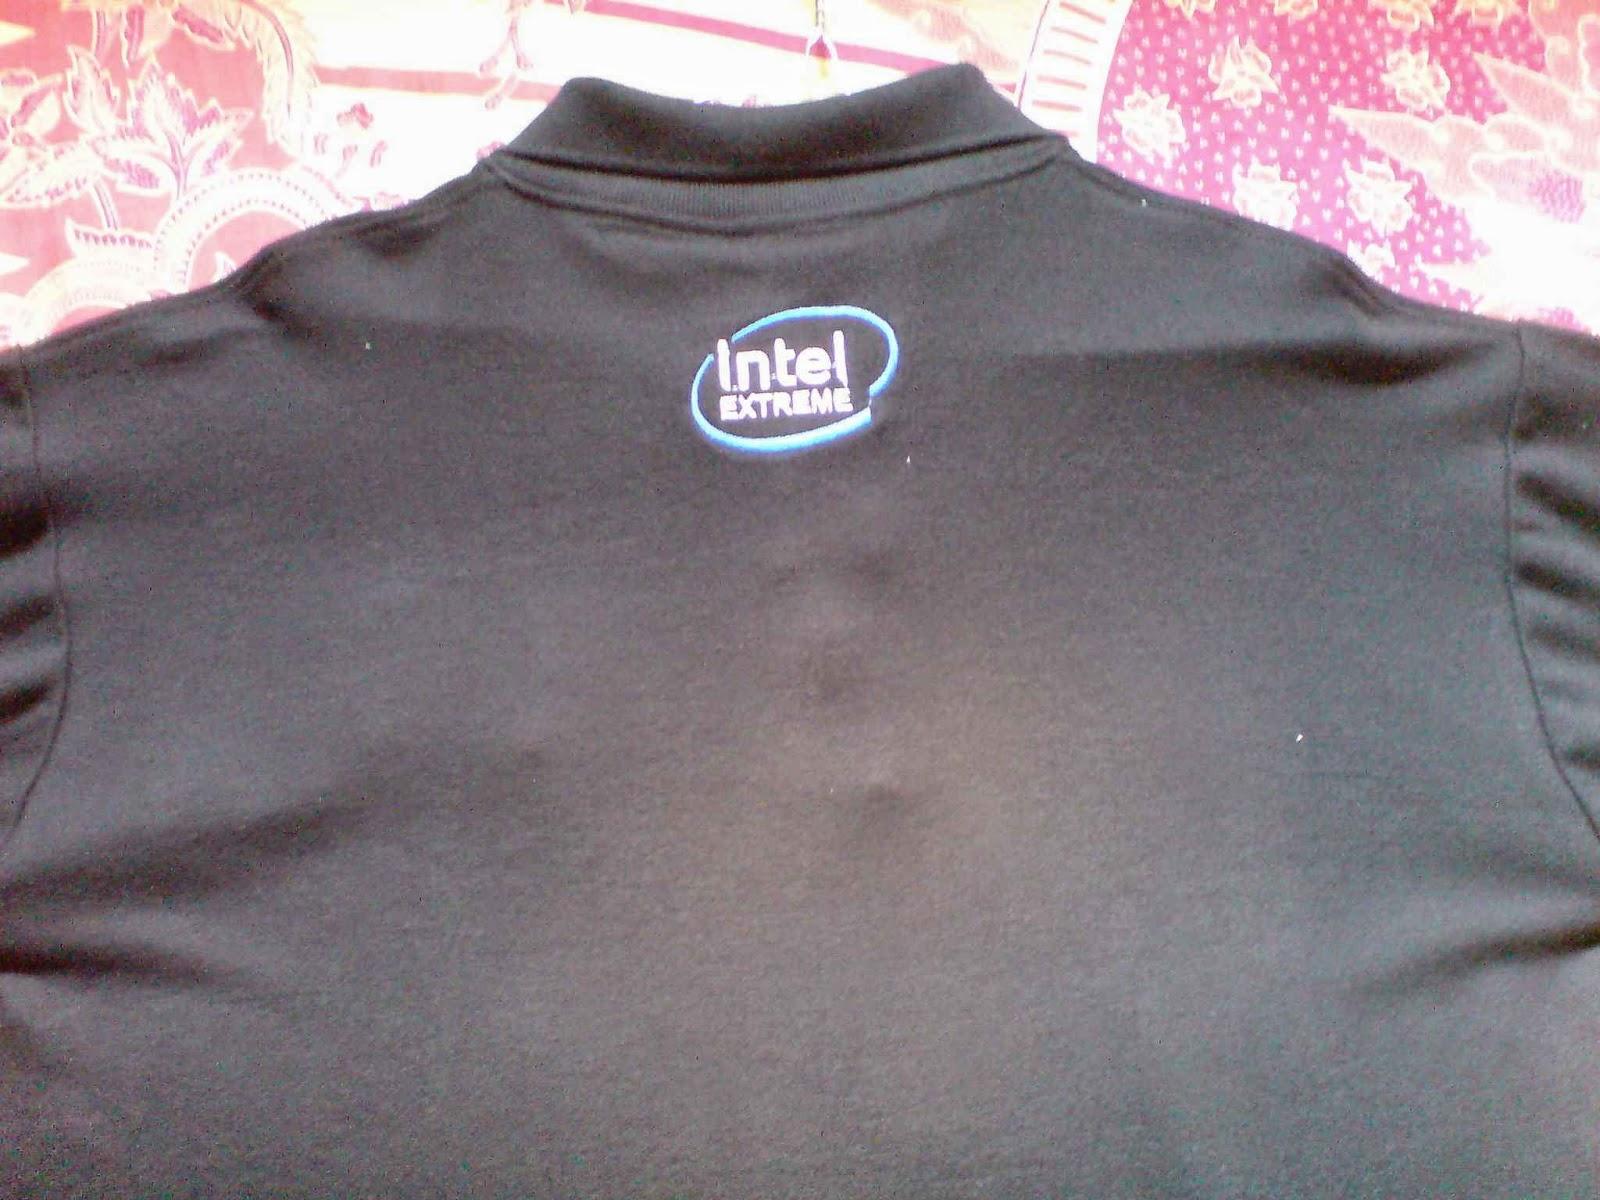 Jual Kaos Polo Logo Intel Extreme Kualitas Distro